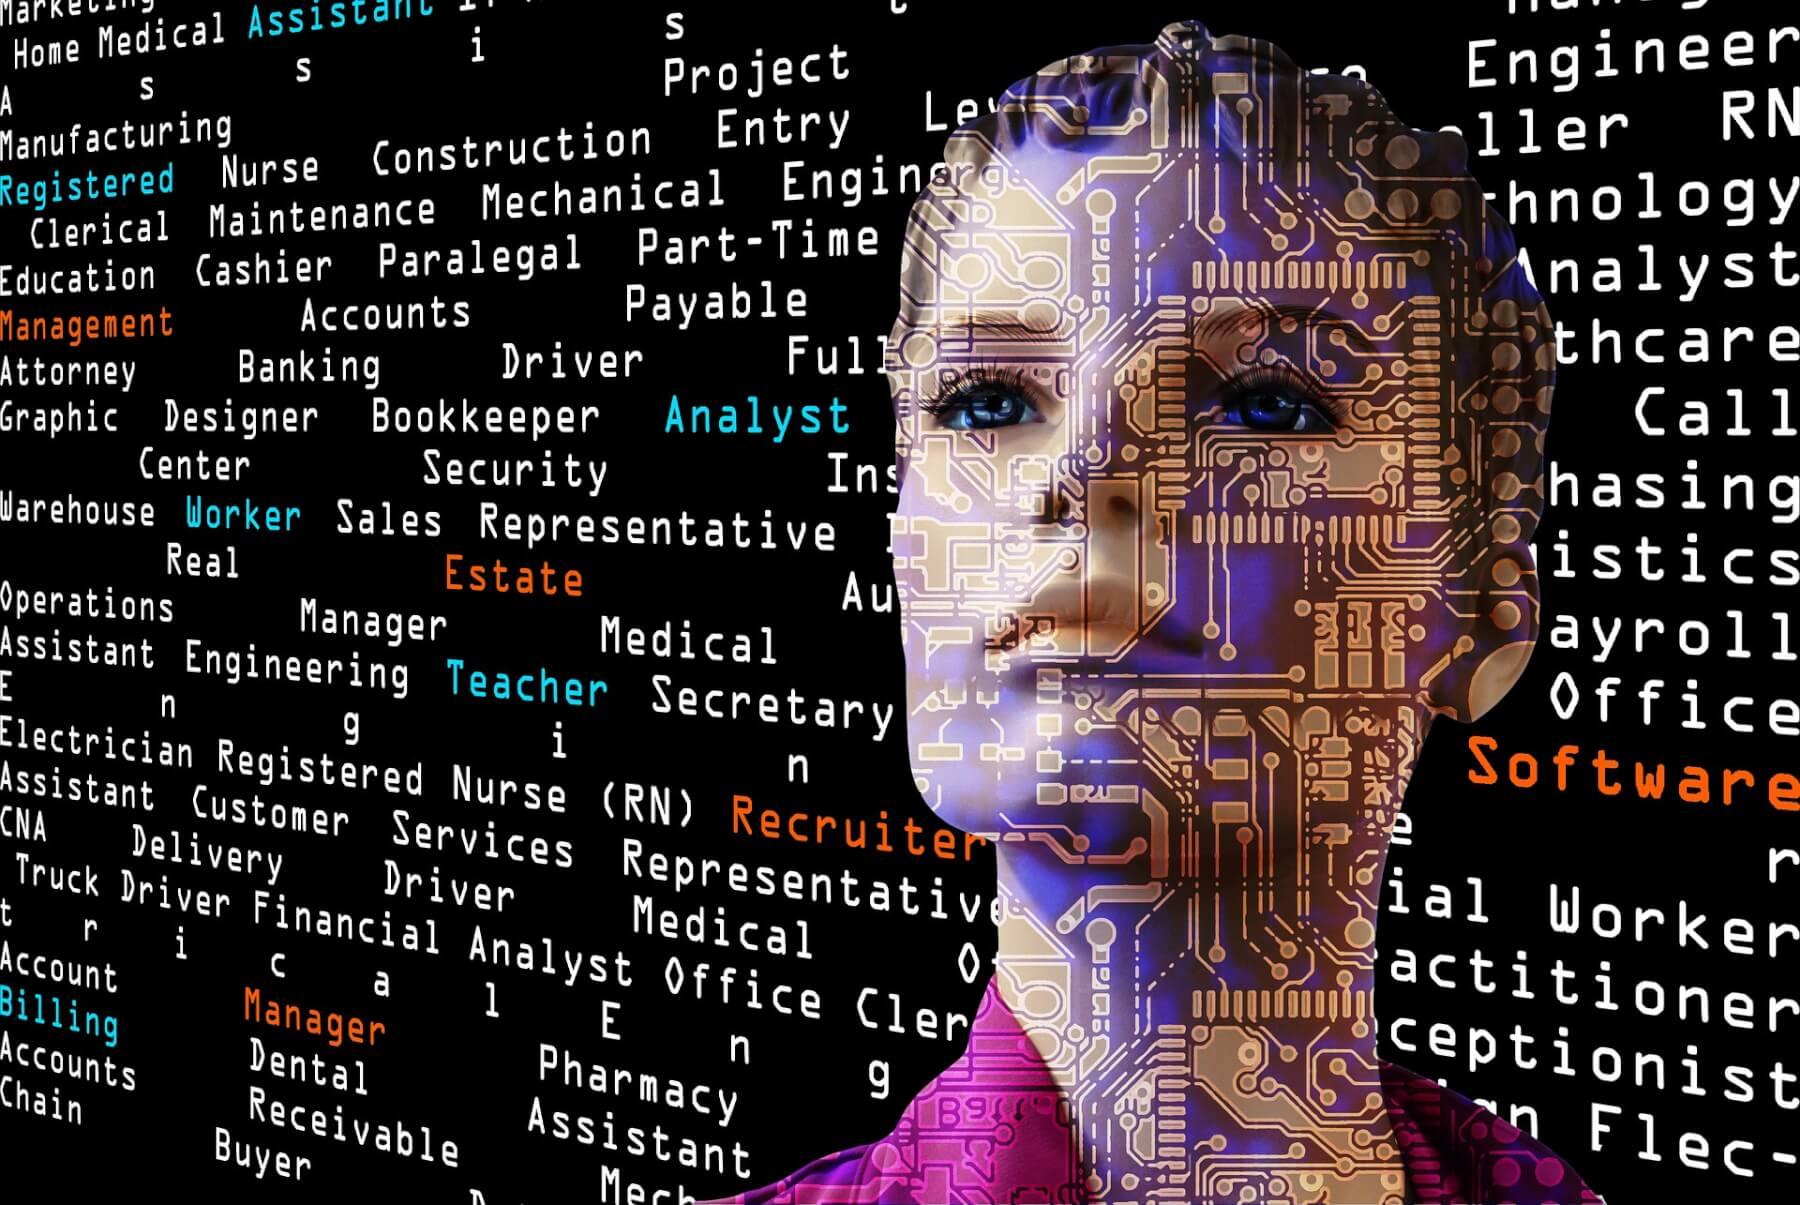 Drohnen-Manager oder Nostalgist? 10 Jobs der Zukunft [Infografik]